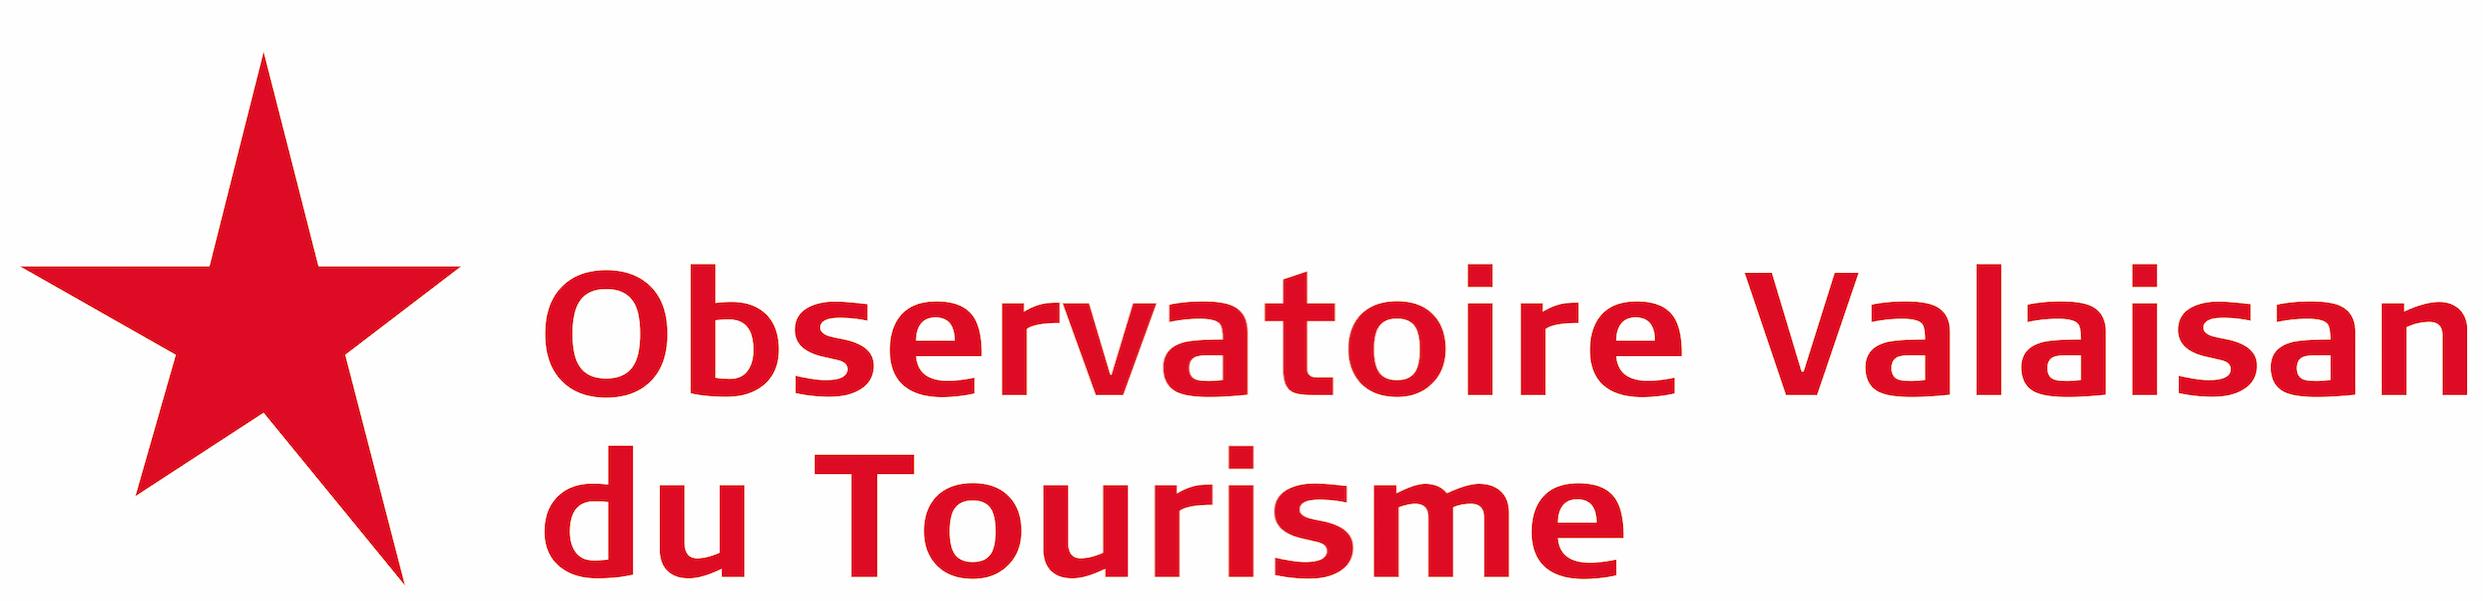 logo_observatoire_valaisant_tourisme